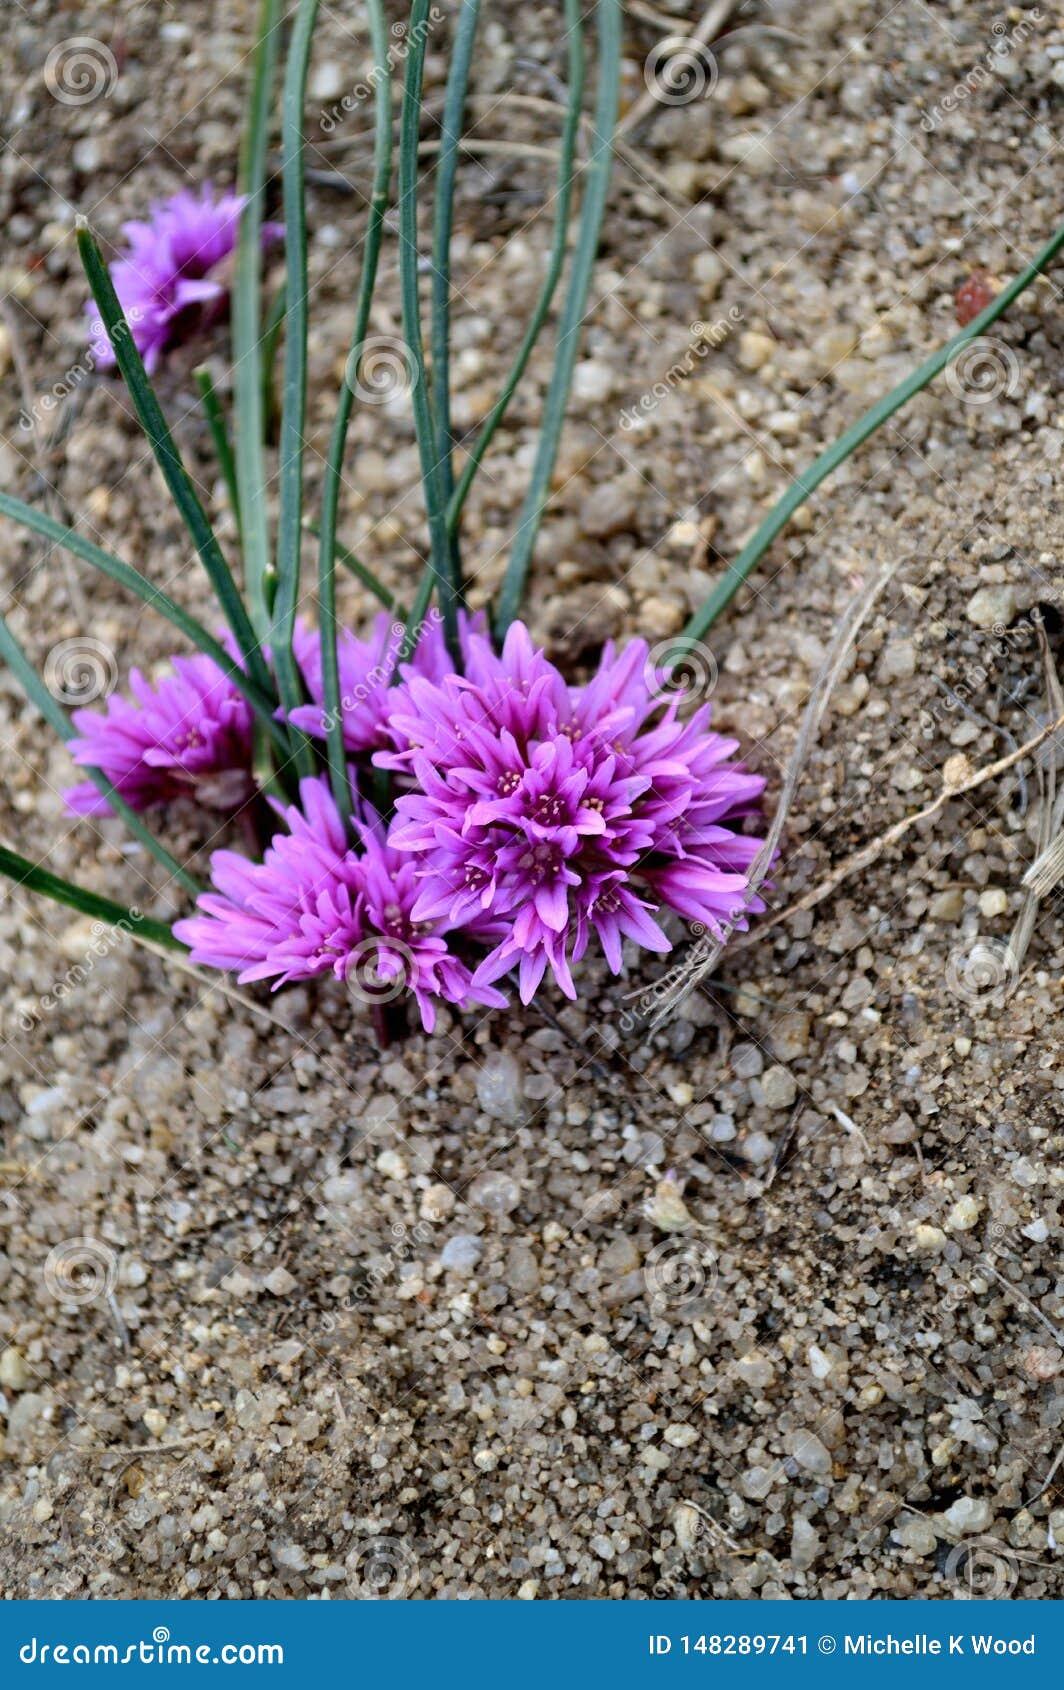 Allium Aaseae rare endangered species native to Idaho